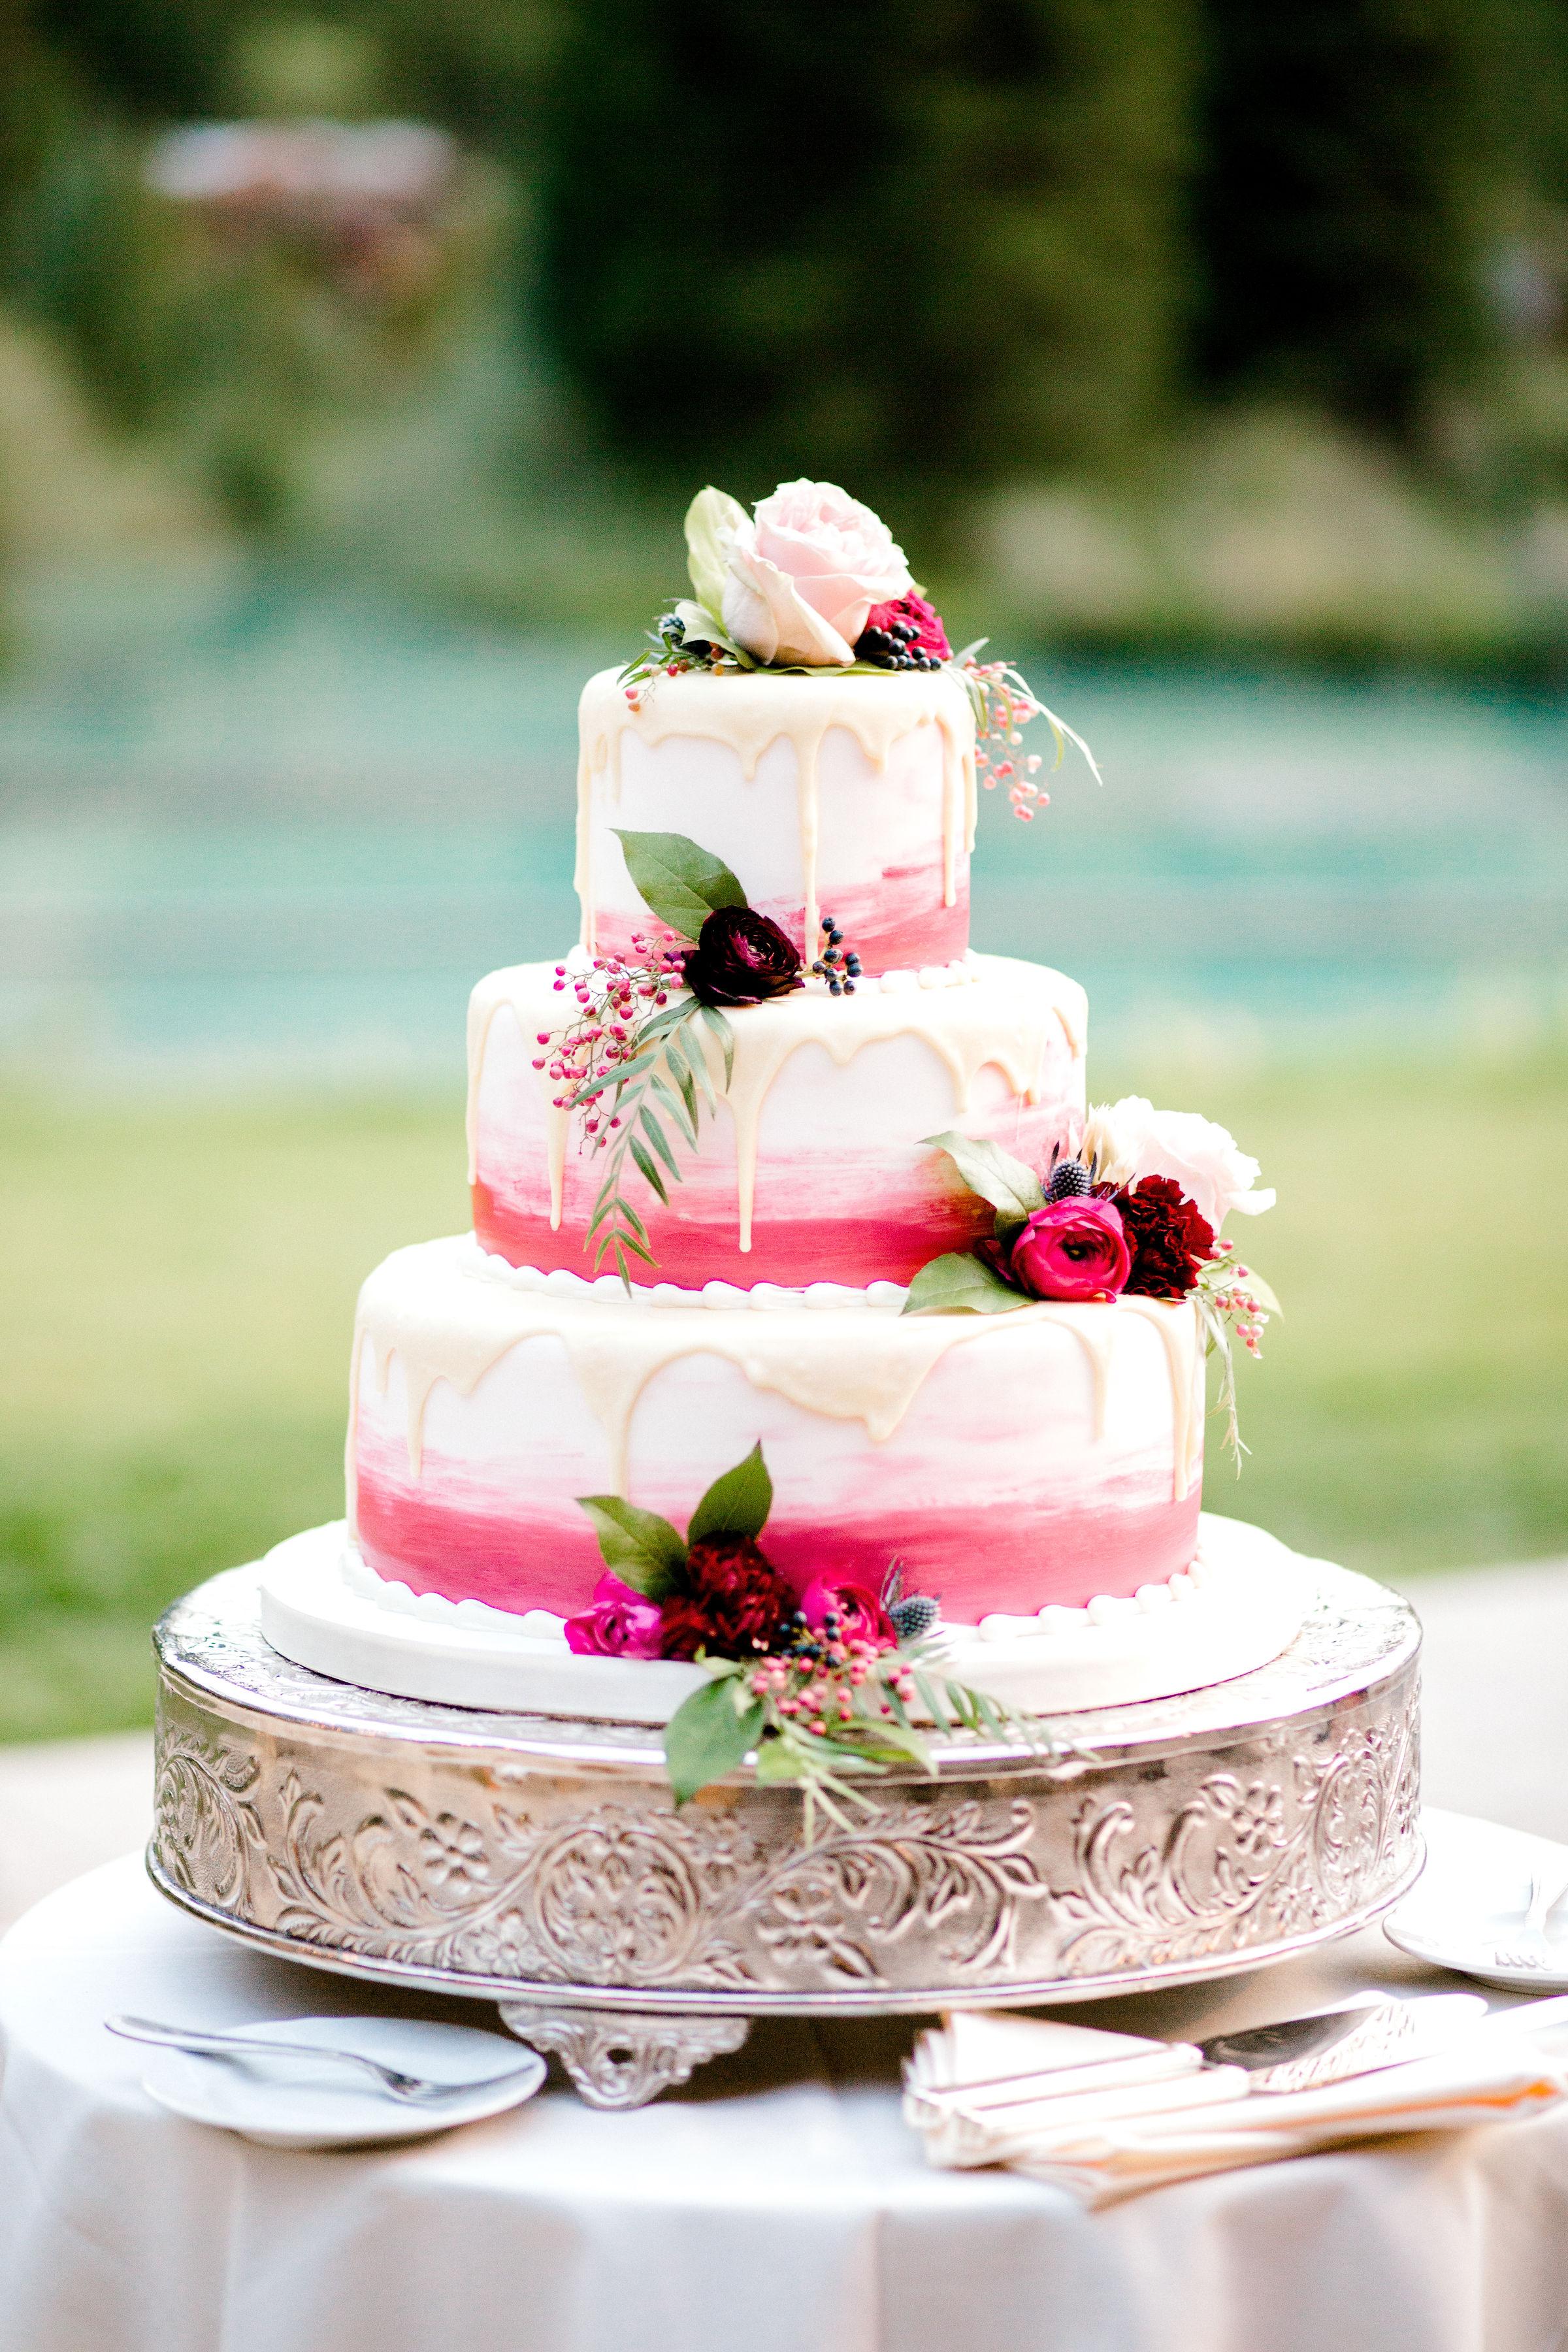 Cake by Ned Archibald - Keystone Resort